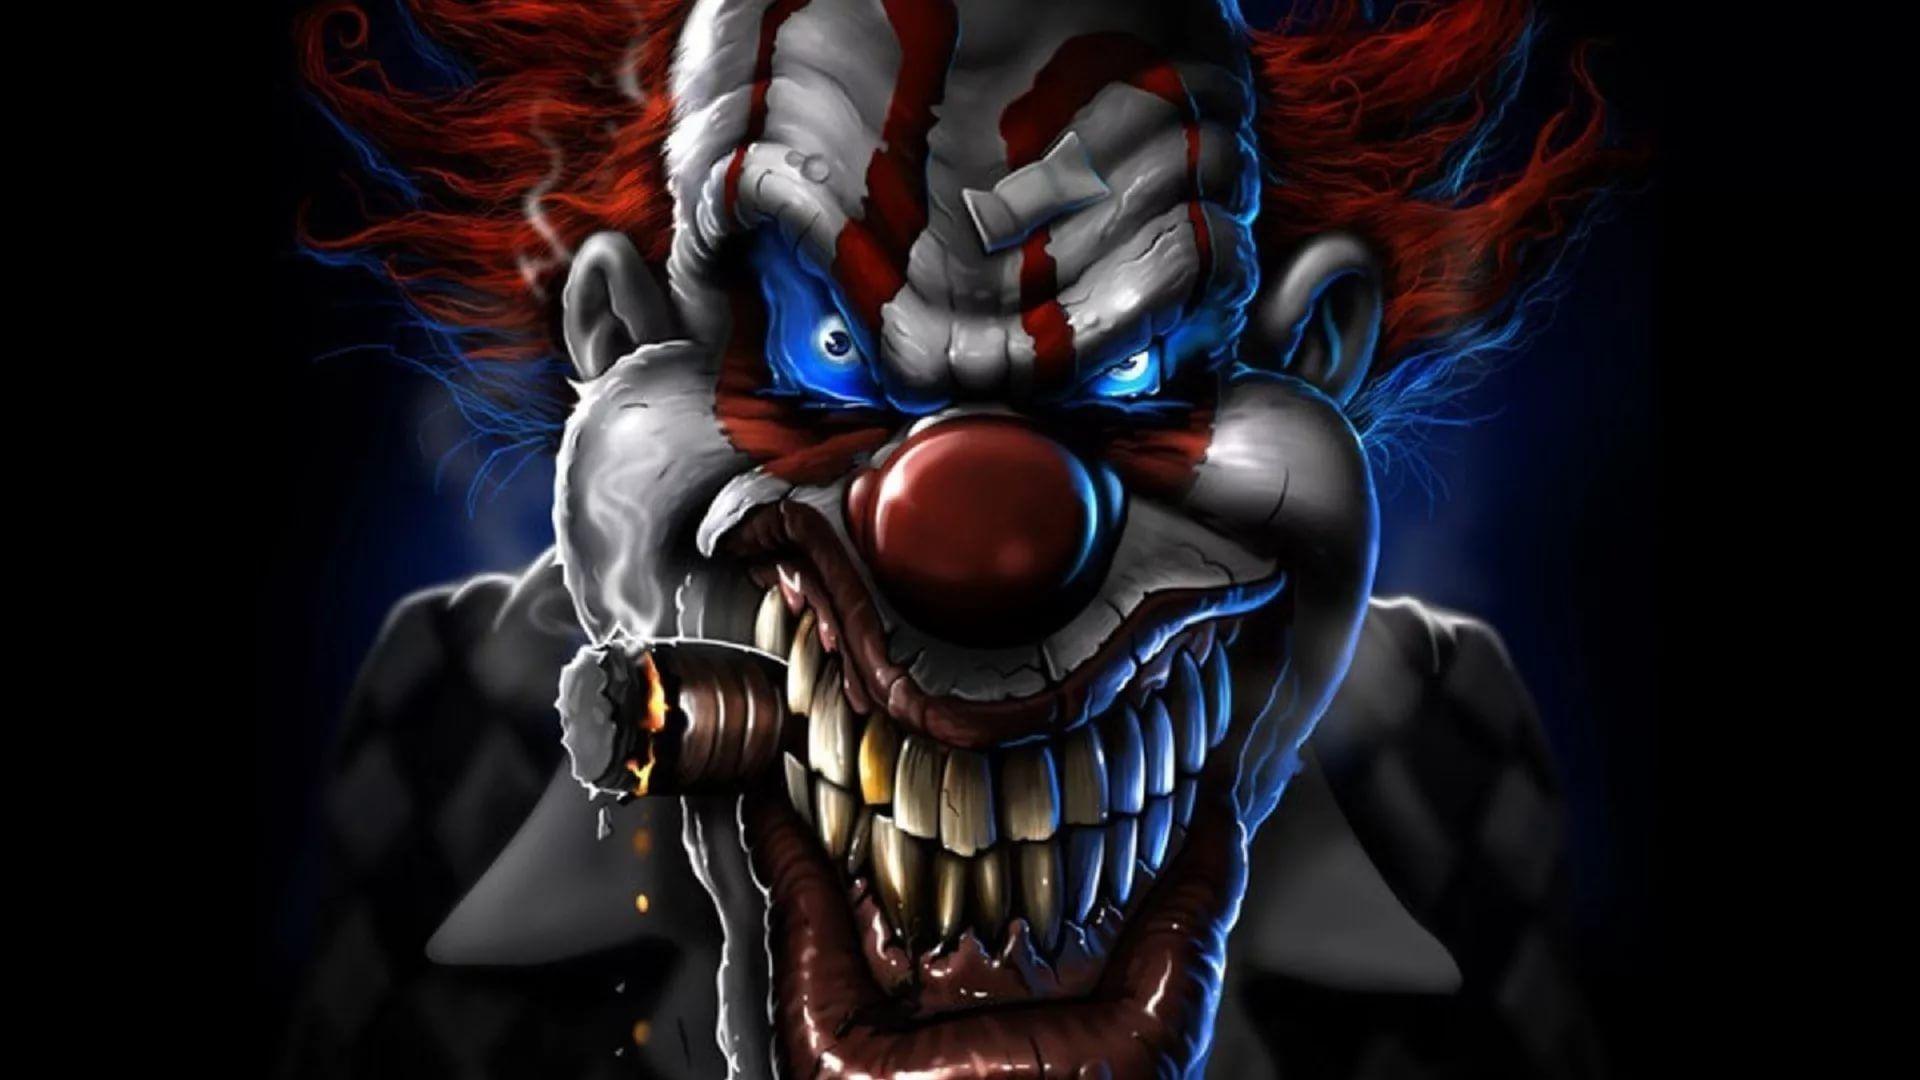 Killer Clown wallpaper photo full hd